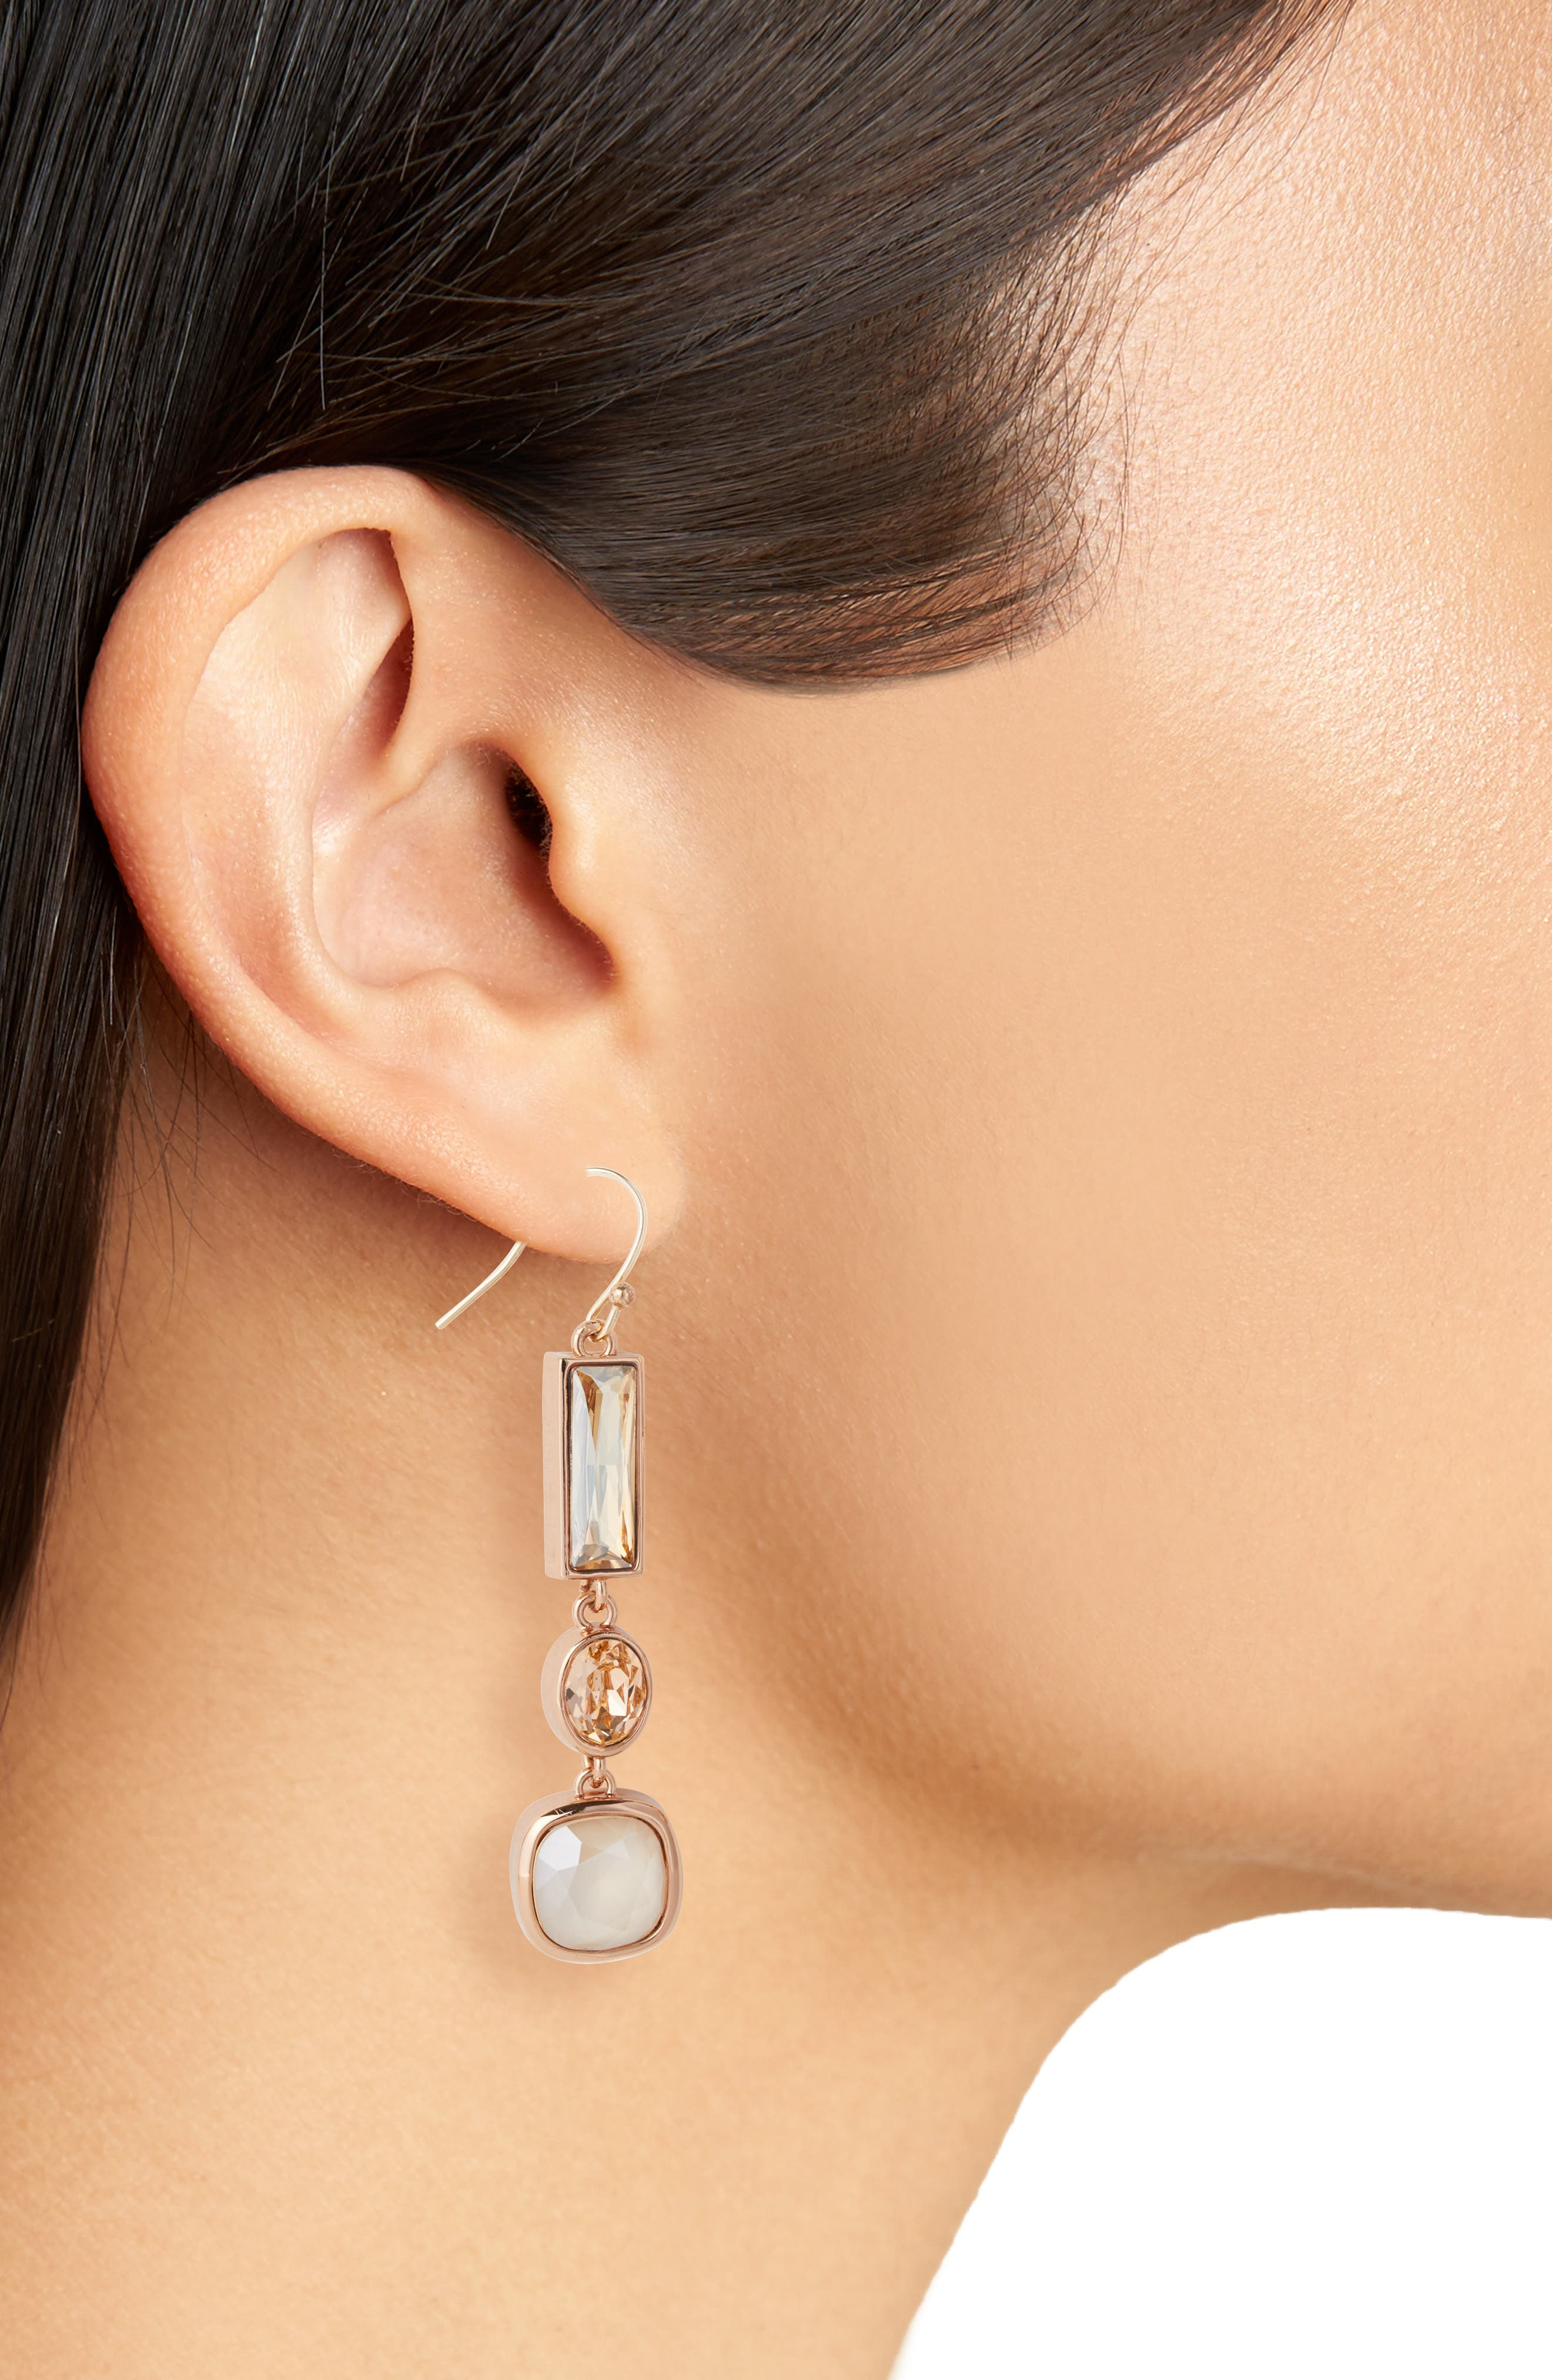 Swarovski Crystal Drop Earrings,                             Alternate thumbnail 3, color,                             220